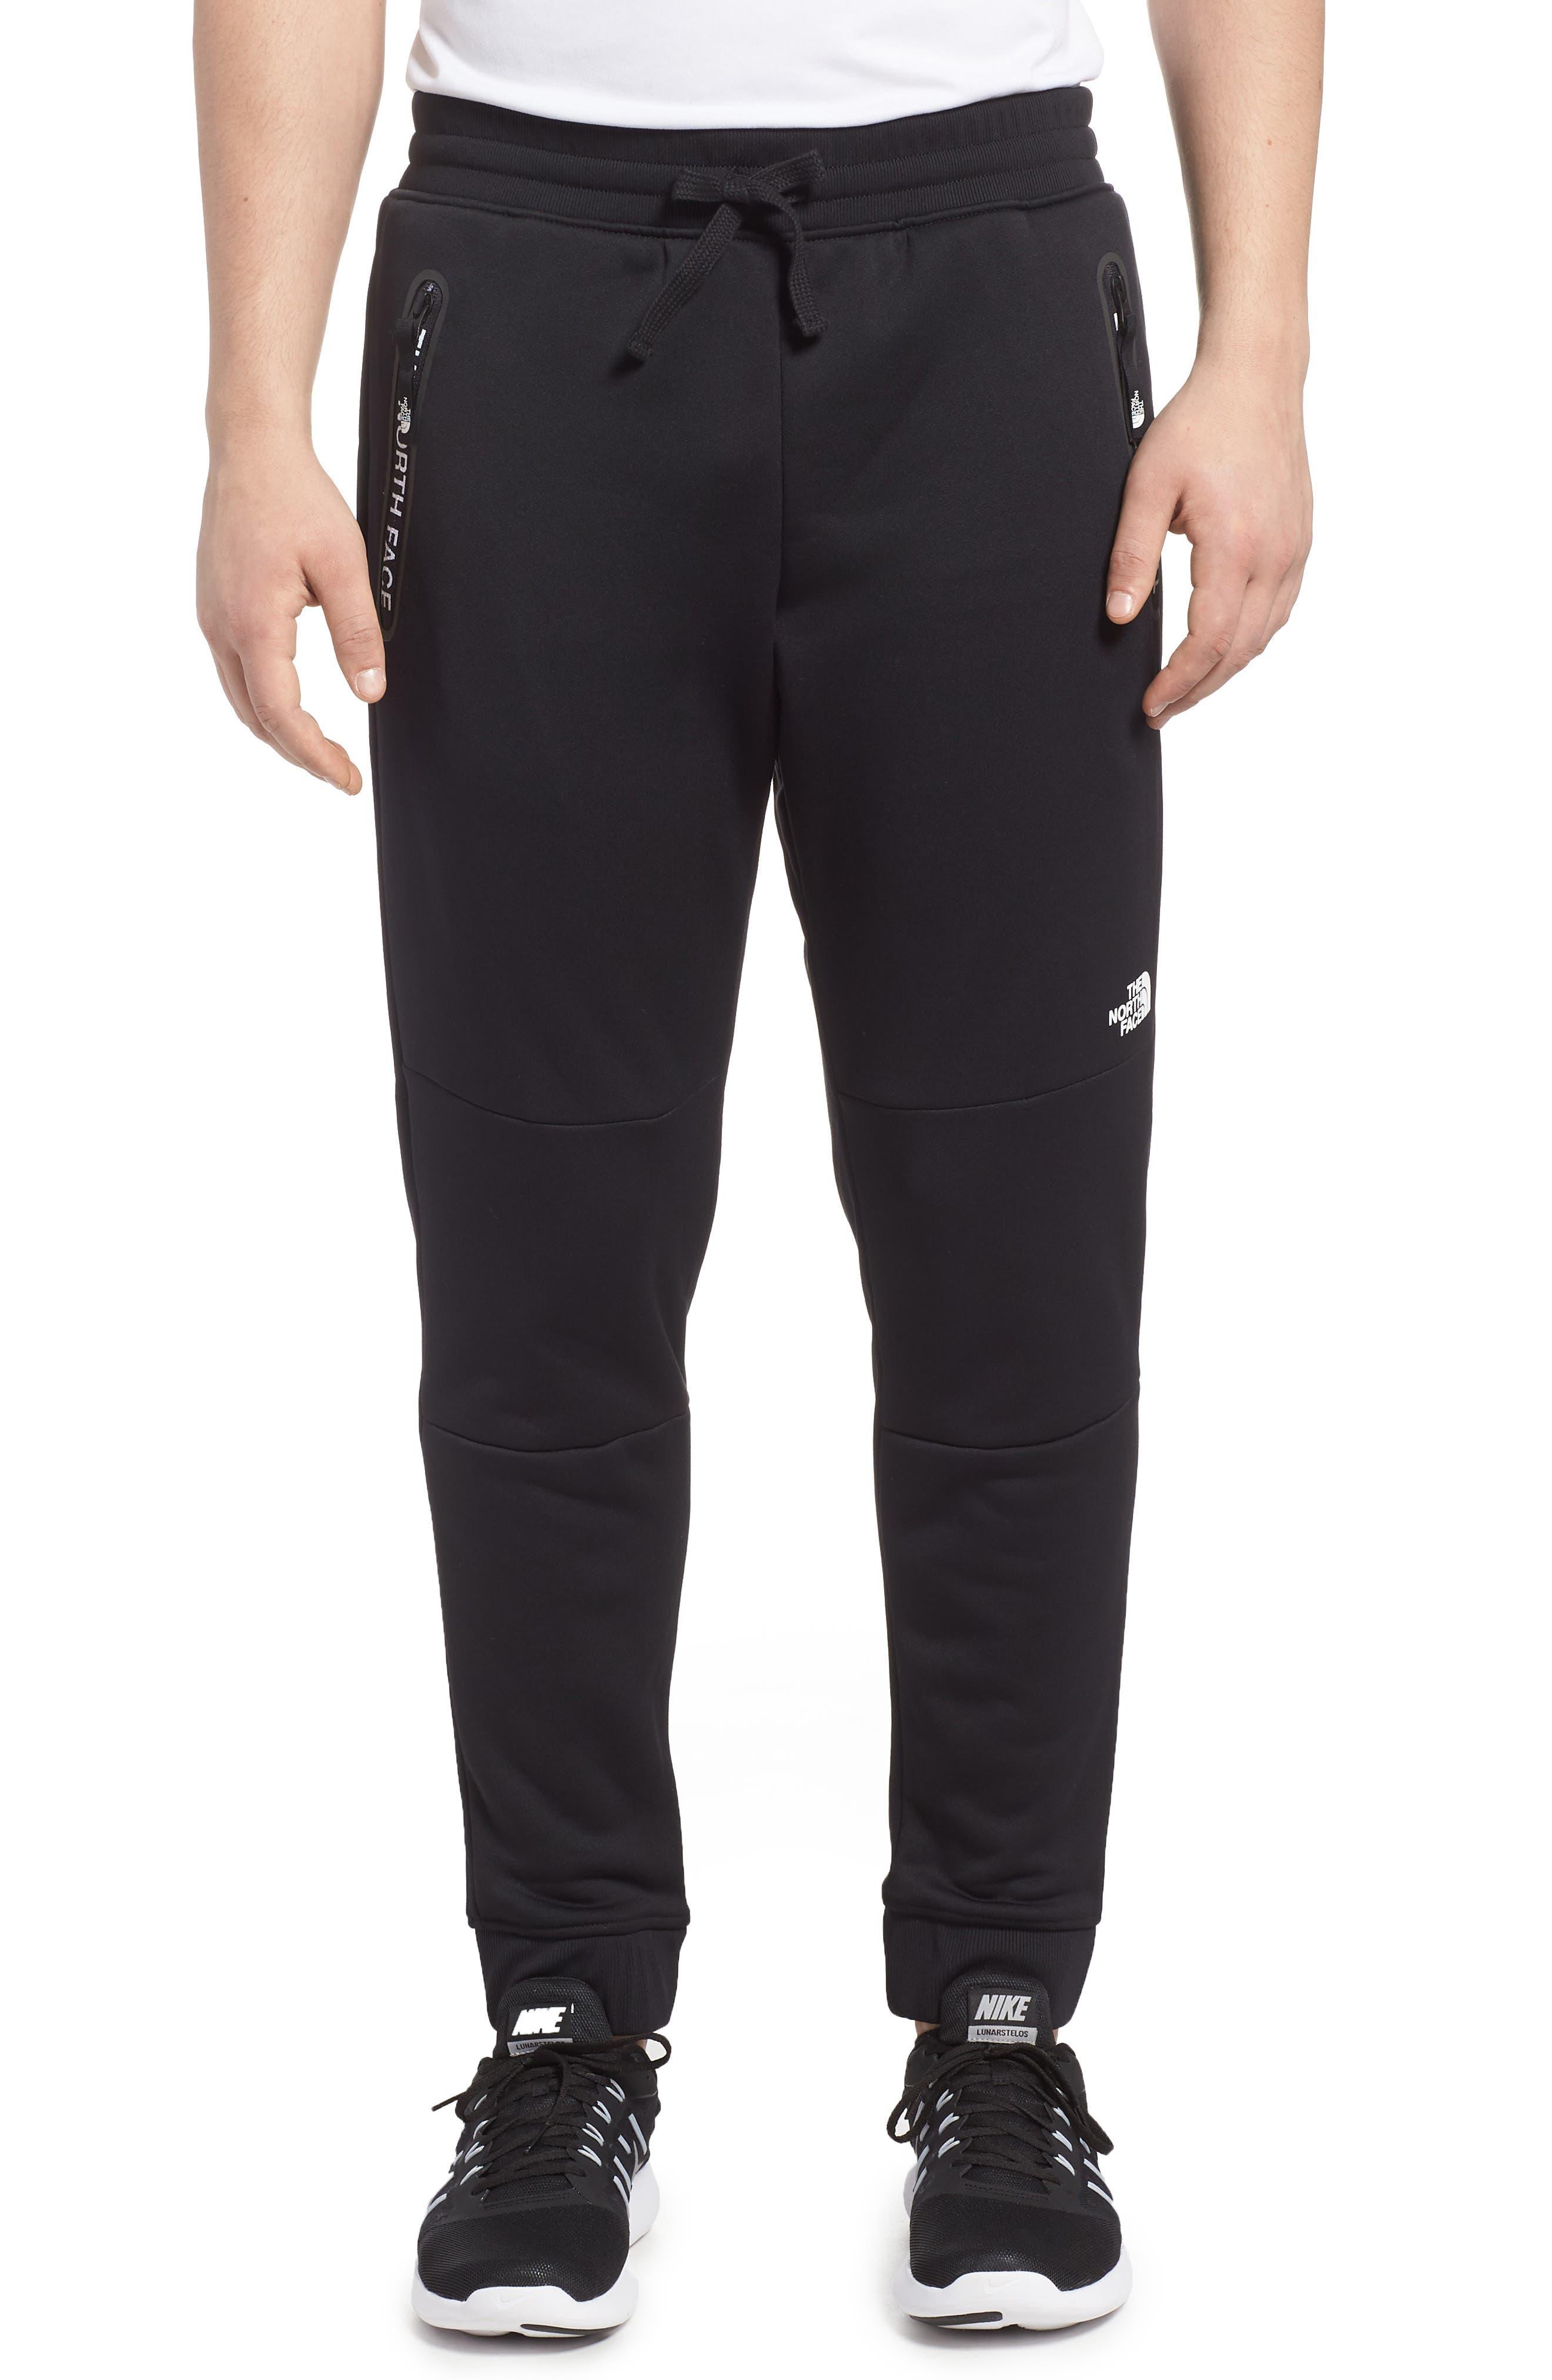 Mount Modern Jogger Pants,                         Main,                         color, Tnf Black